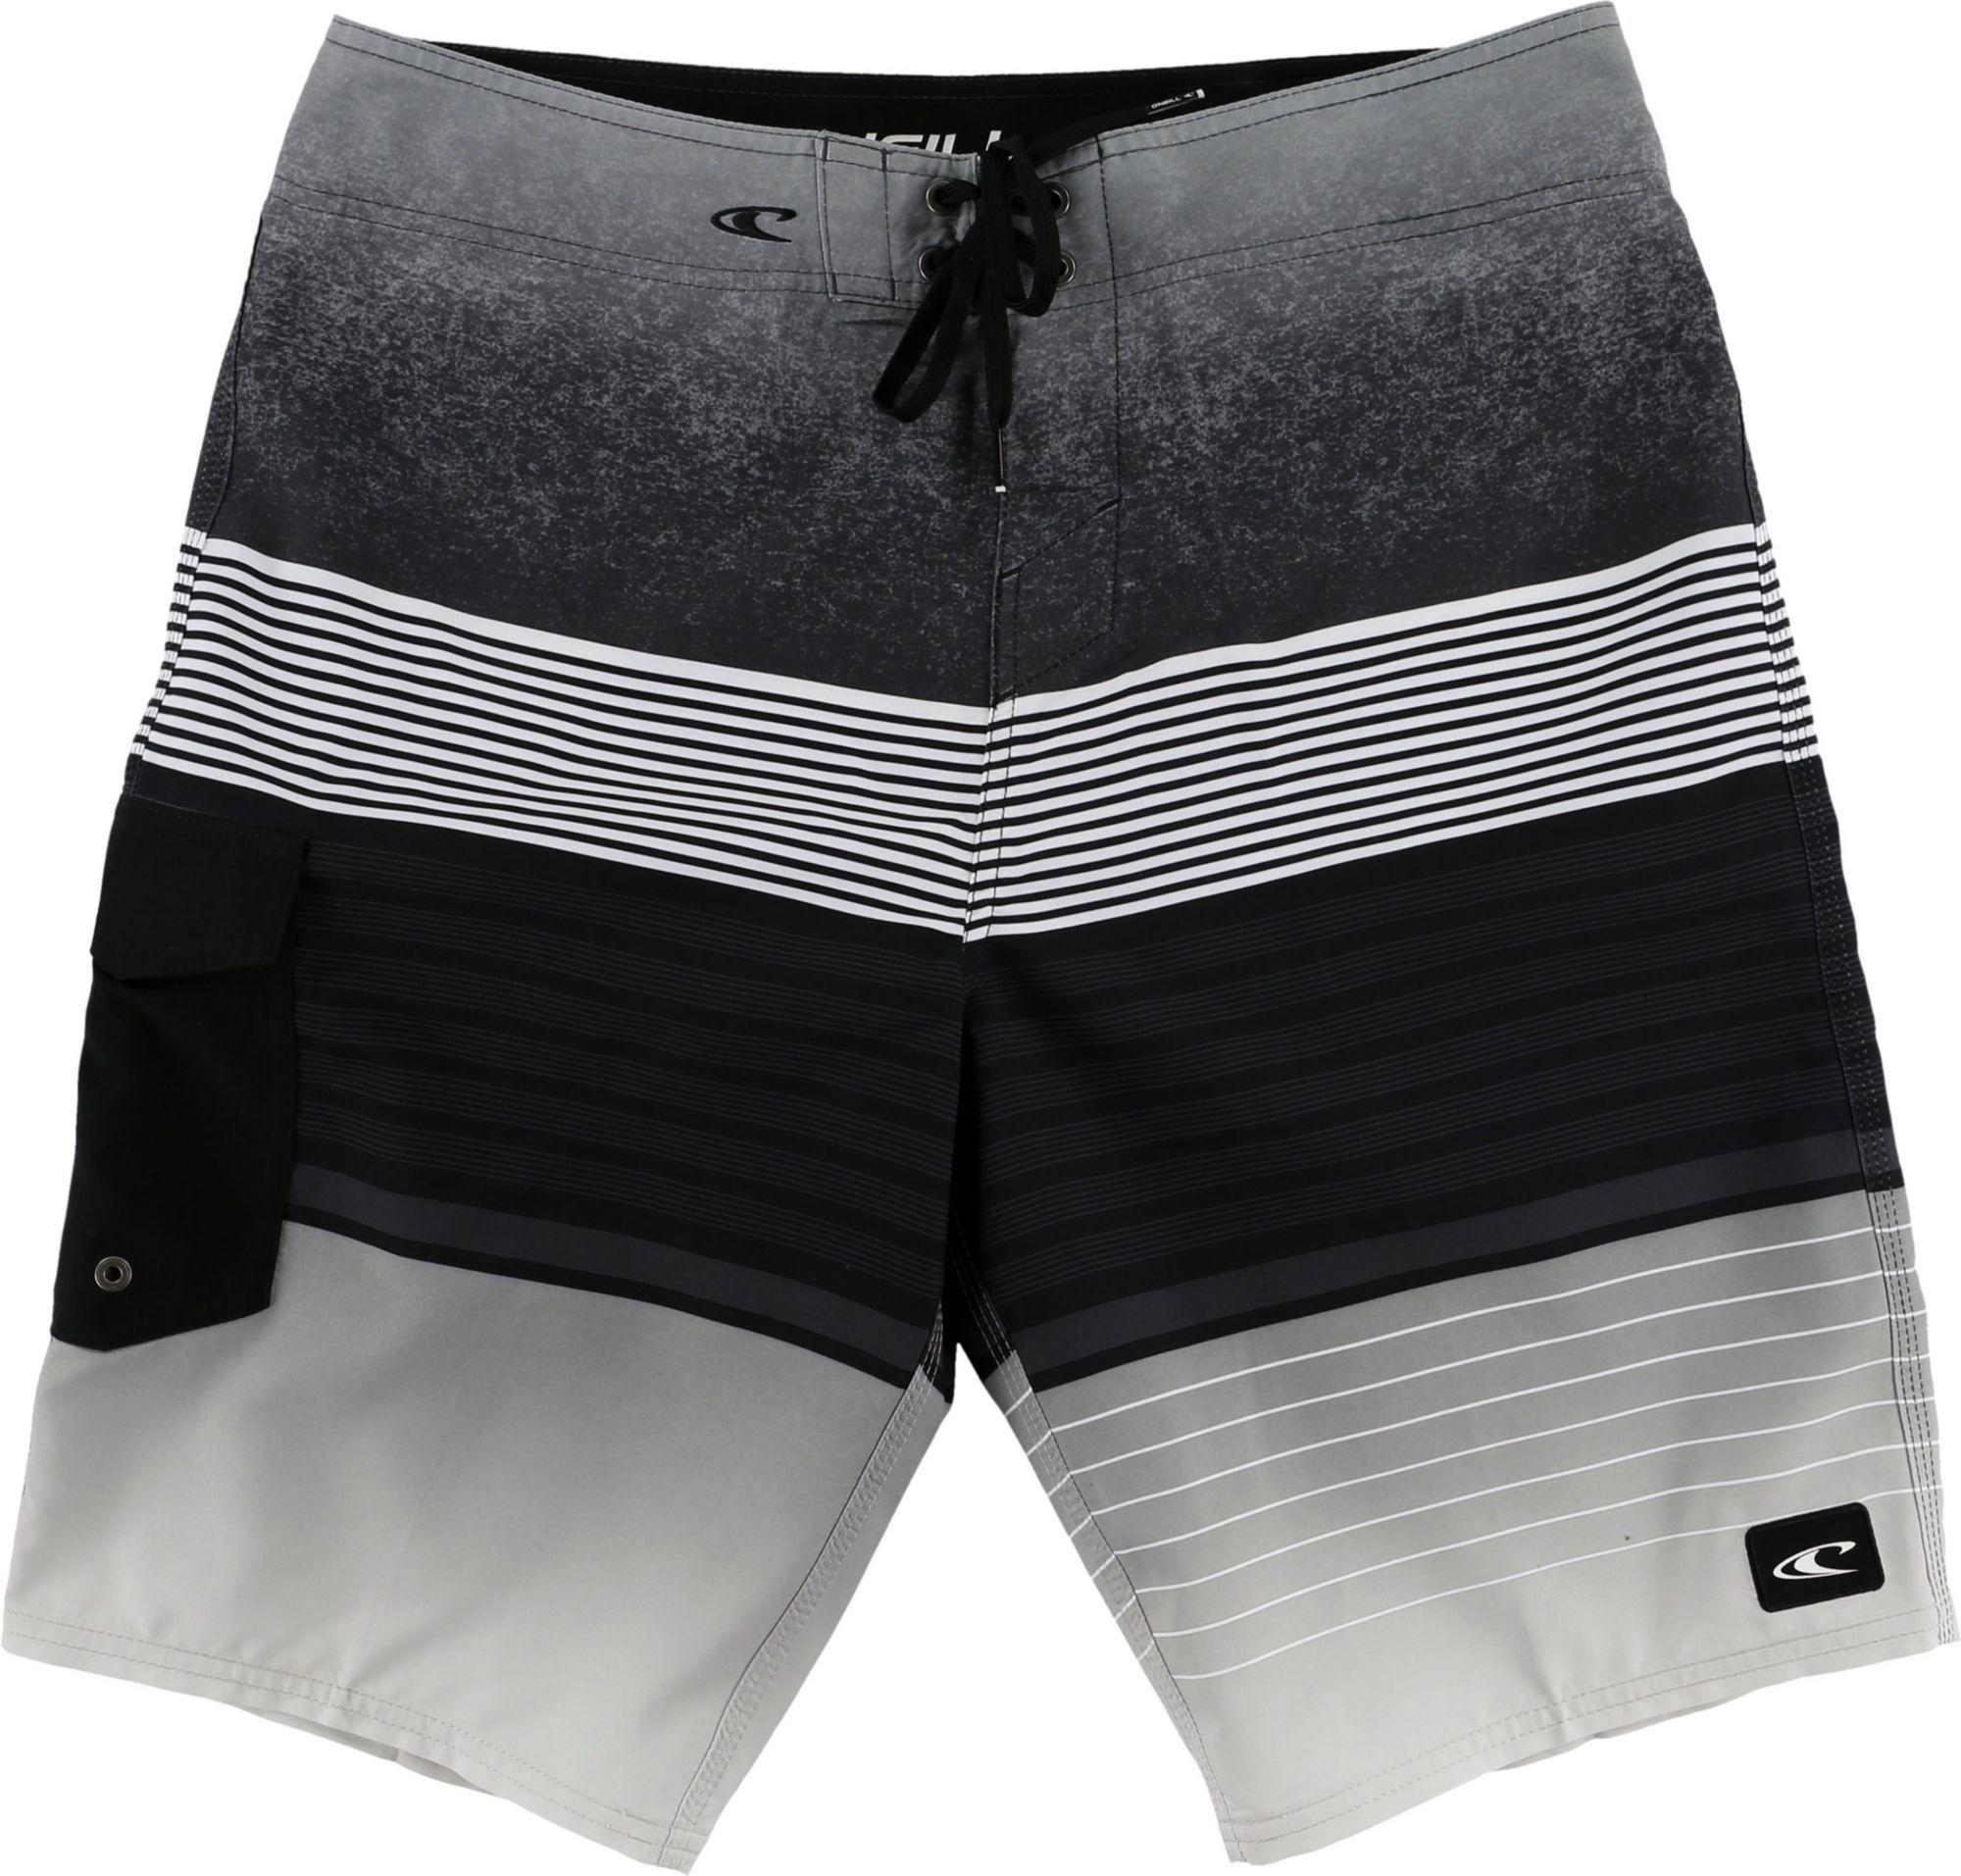 6fd99b8d66 O'Neill Men's Lennox 21'' Board Shorts, Size: 32, Black | Products